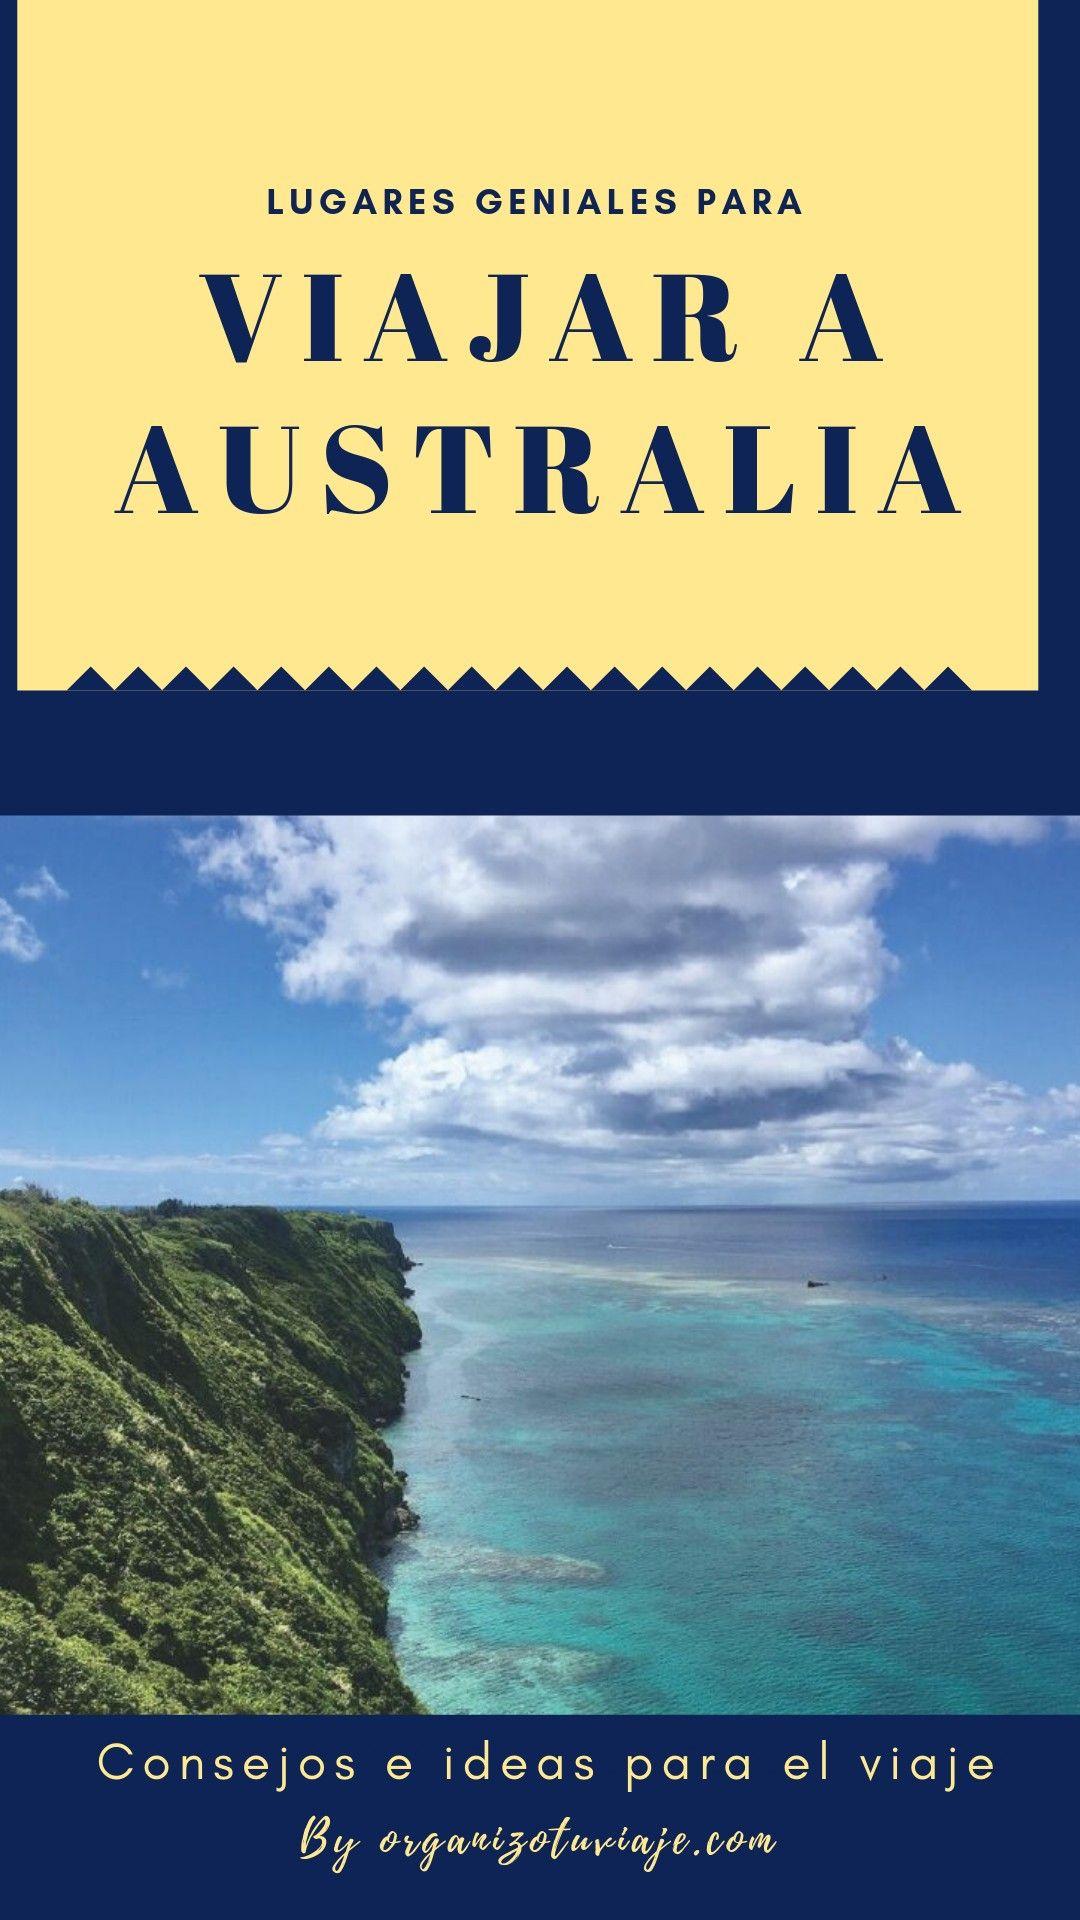 Viajar A Australia Lugares Geniales Consejos E Ideas Viajar A Australia Australia Viajes